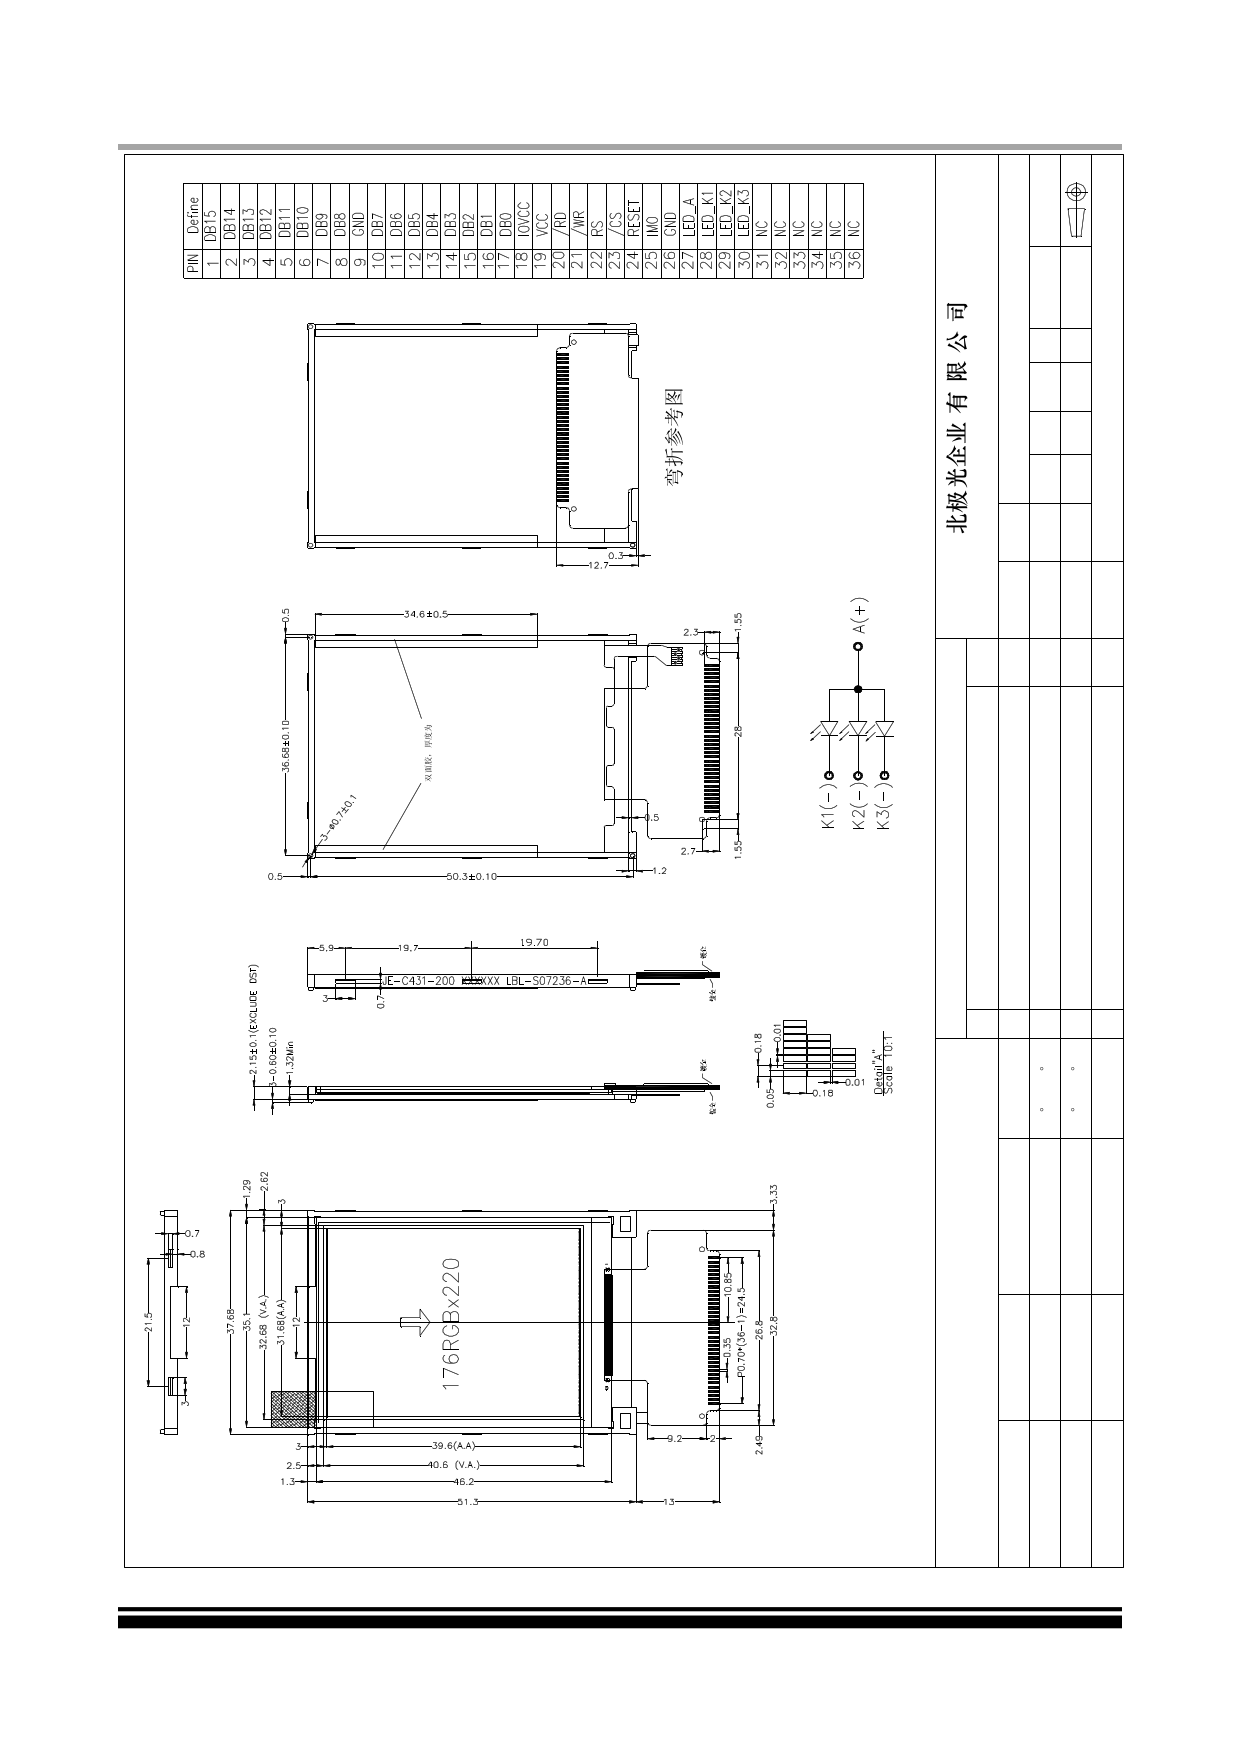 I2003-6IPN1722A pdf